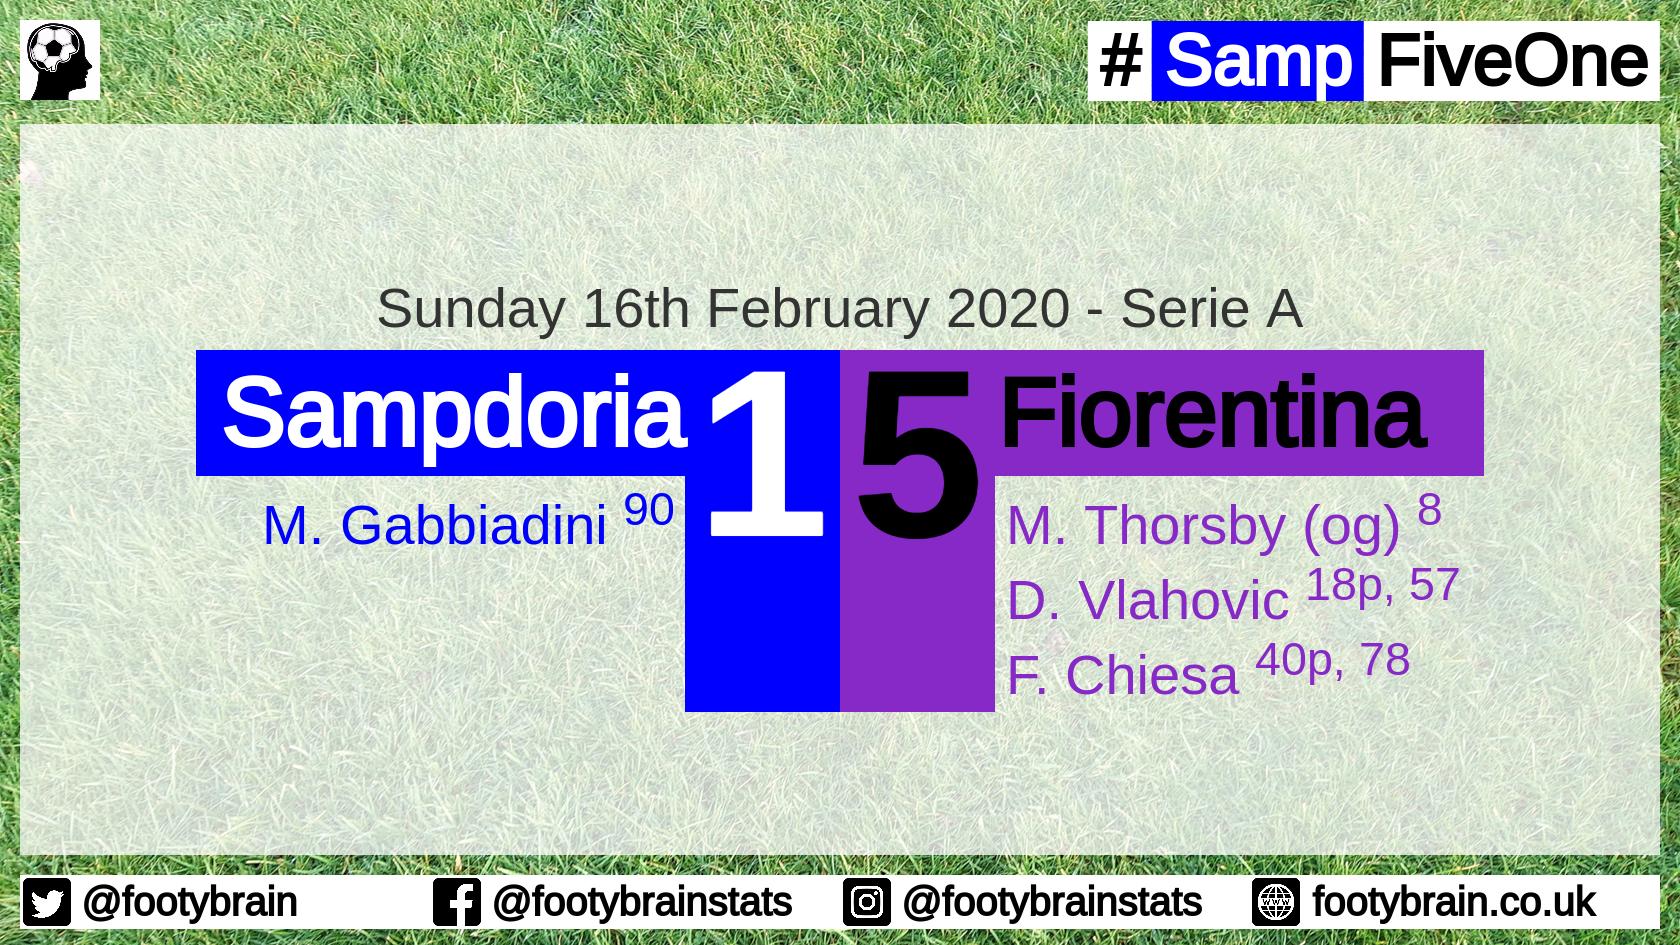 Sampdoria 1 Fiorentina 5, Sunday